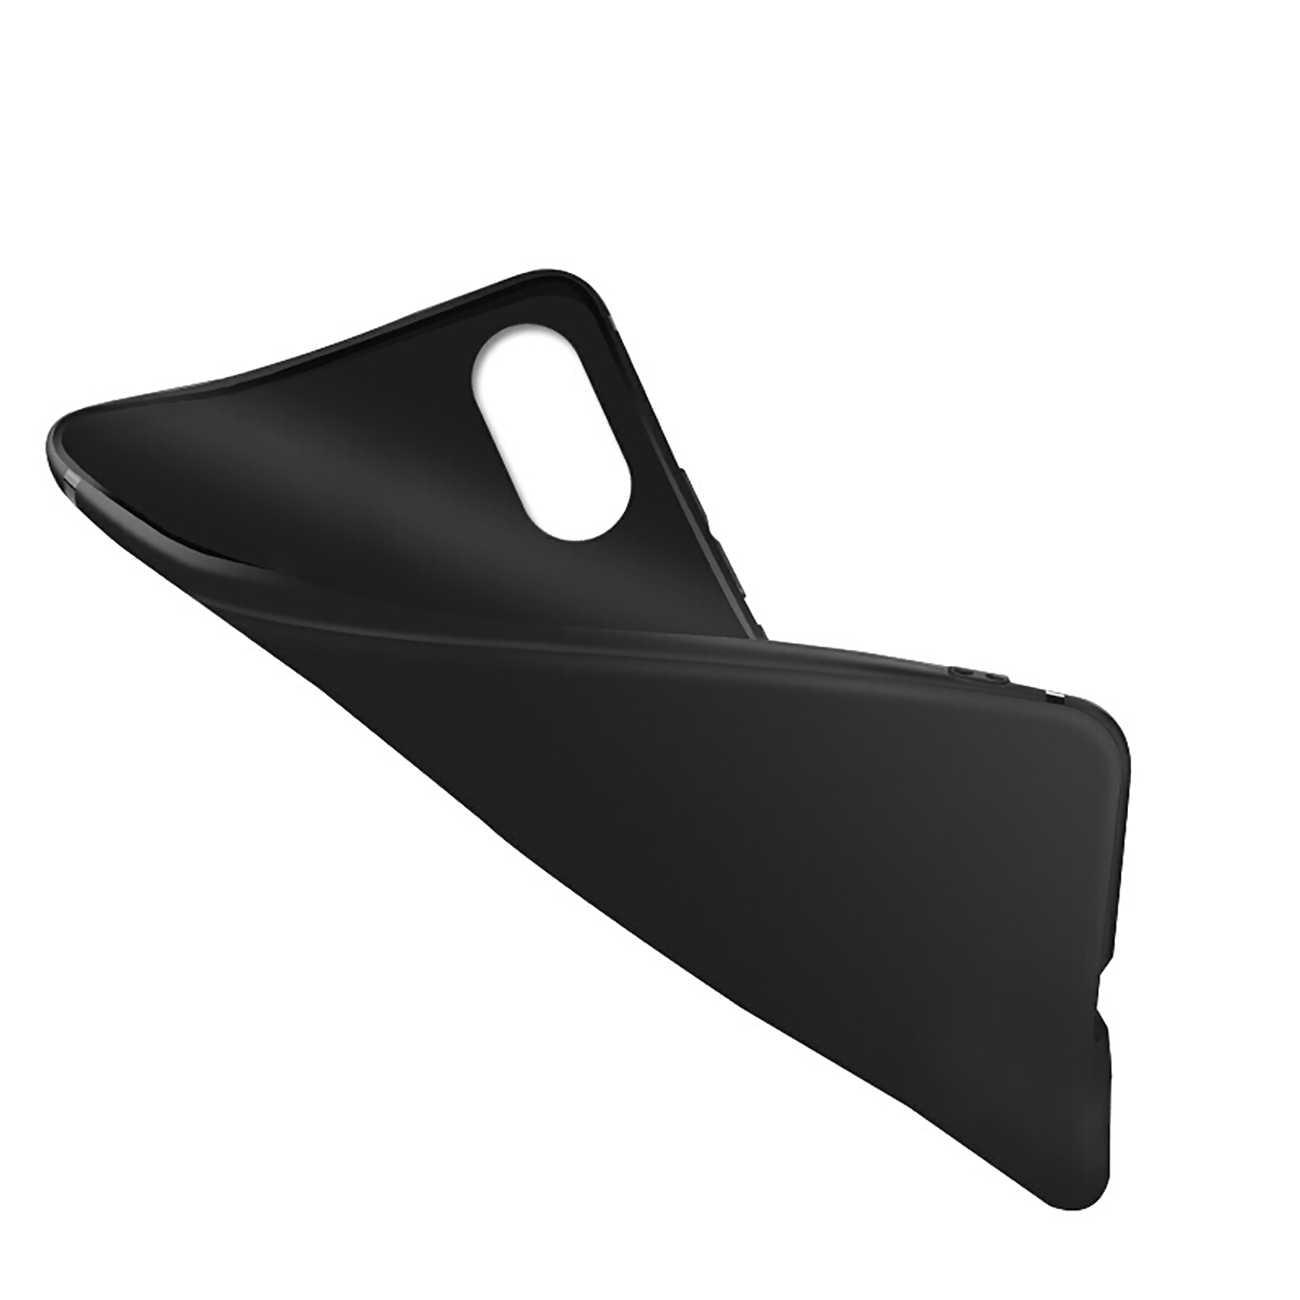 Billie Eilish where do we go Phone Case for Samsung Galaxy J8 J7 Duo J6 J5 J4 Plus 2018 2017 2016 J2 J3 Prime 2015 Cover